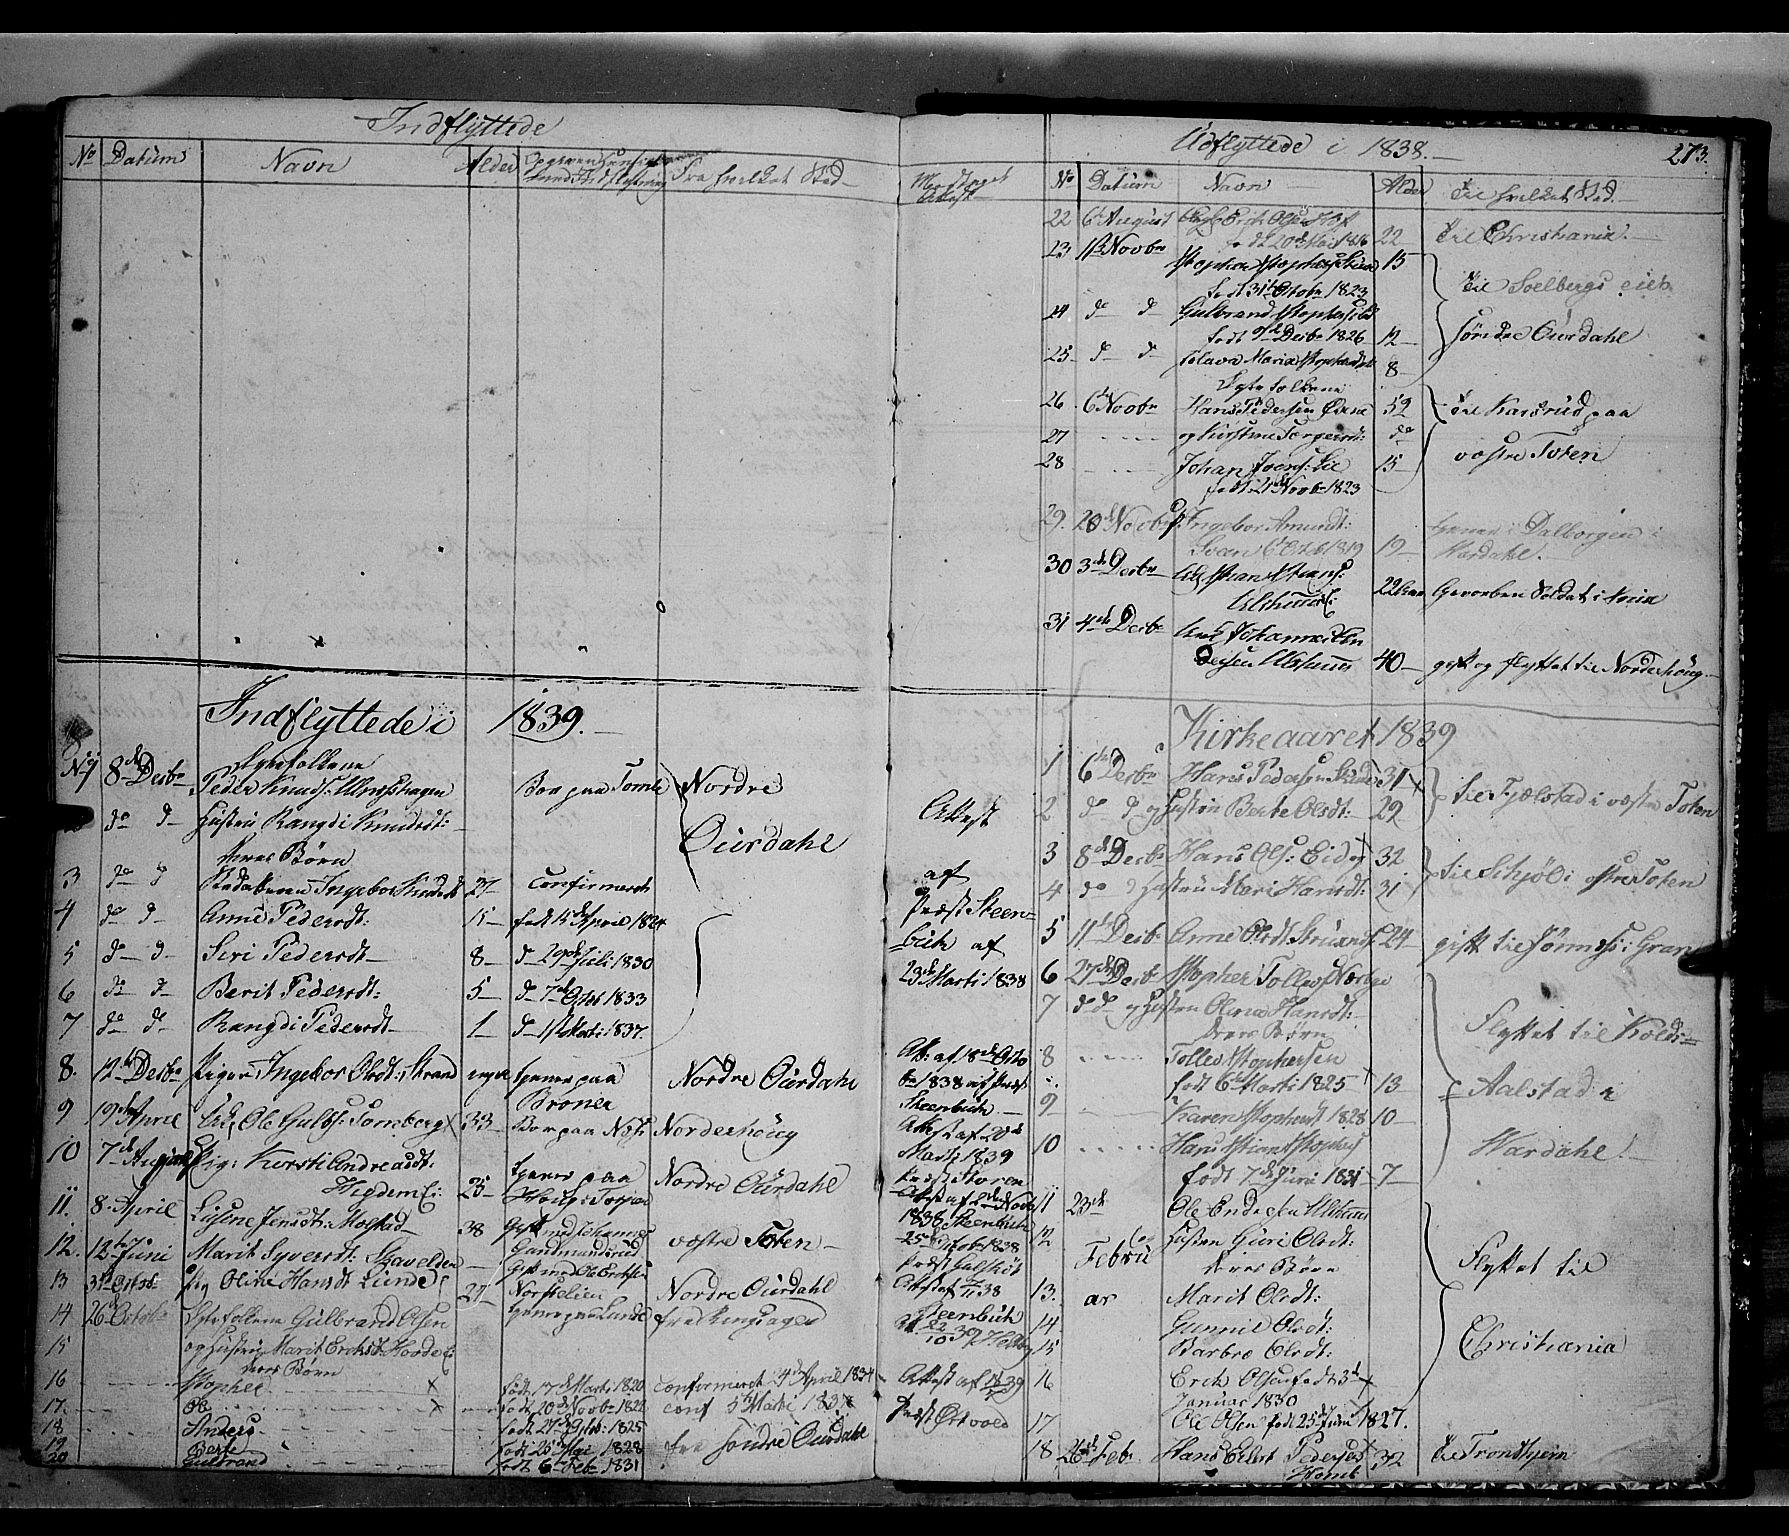 SAH, Land prestekontor, Klokkerbok nr. 2, 1833-1849, s. 273